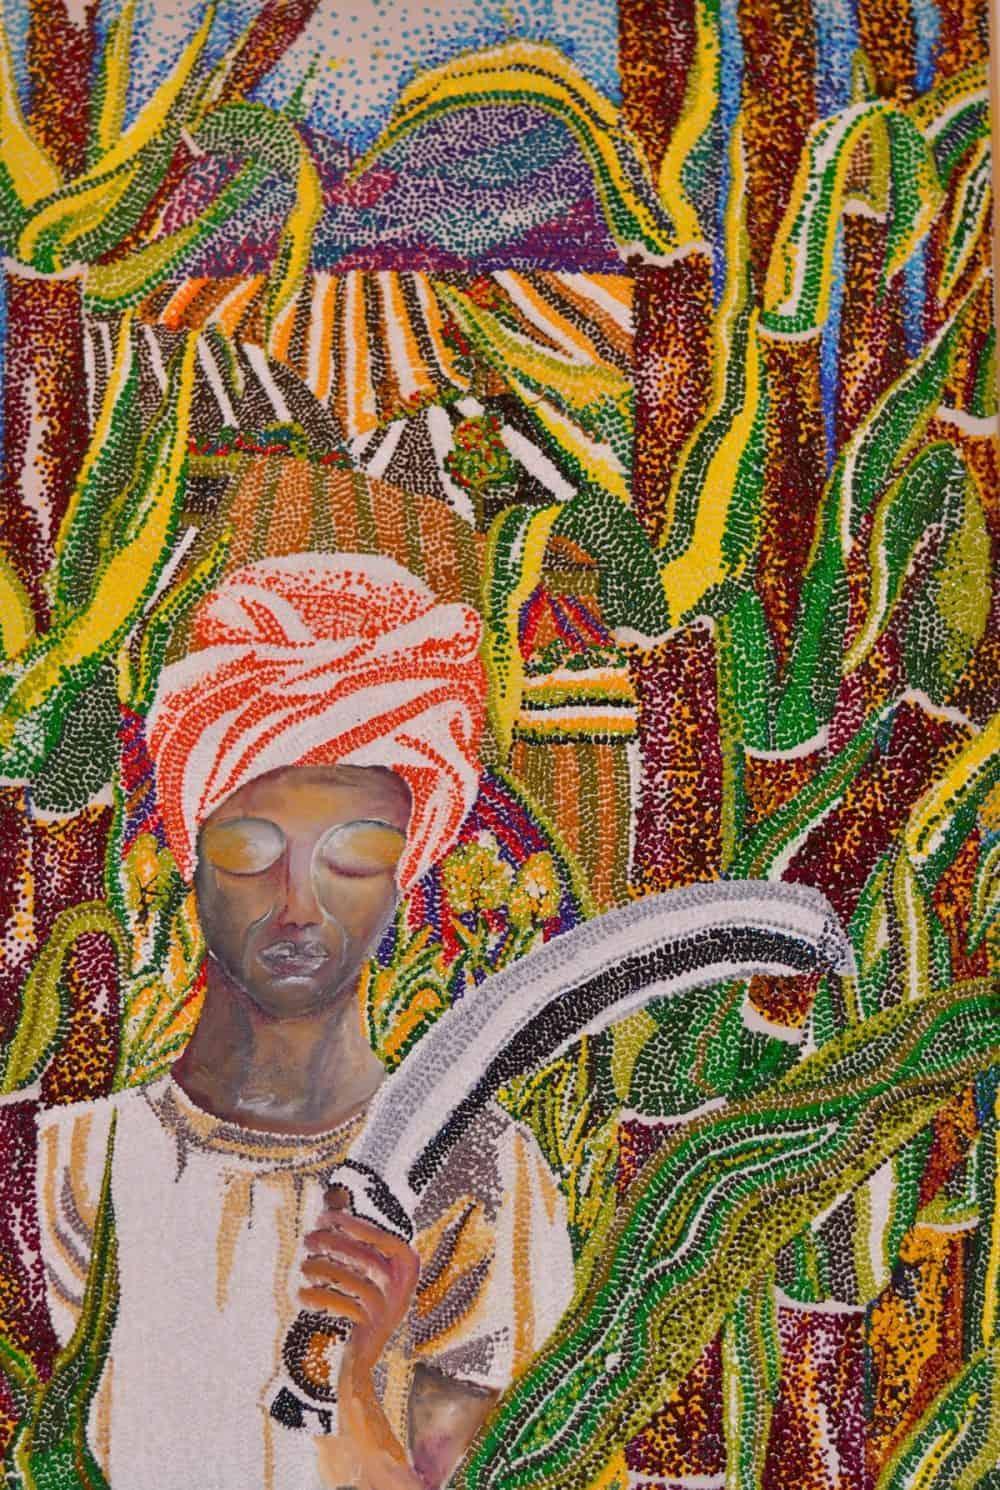 Mauritius Arts & Artists - mauritius-arts-jessie-gooriah-2